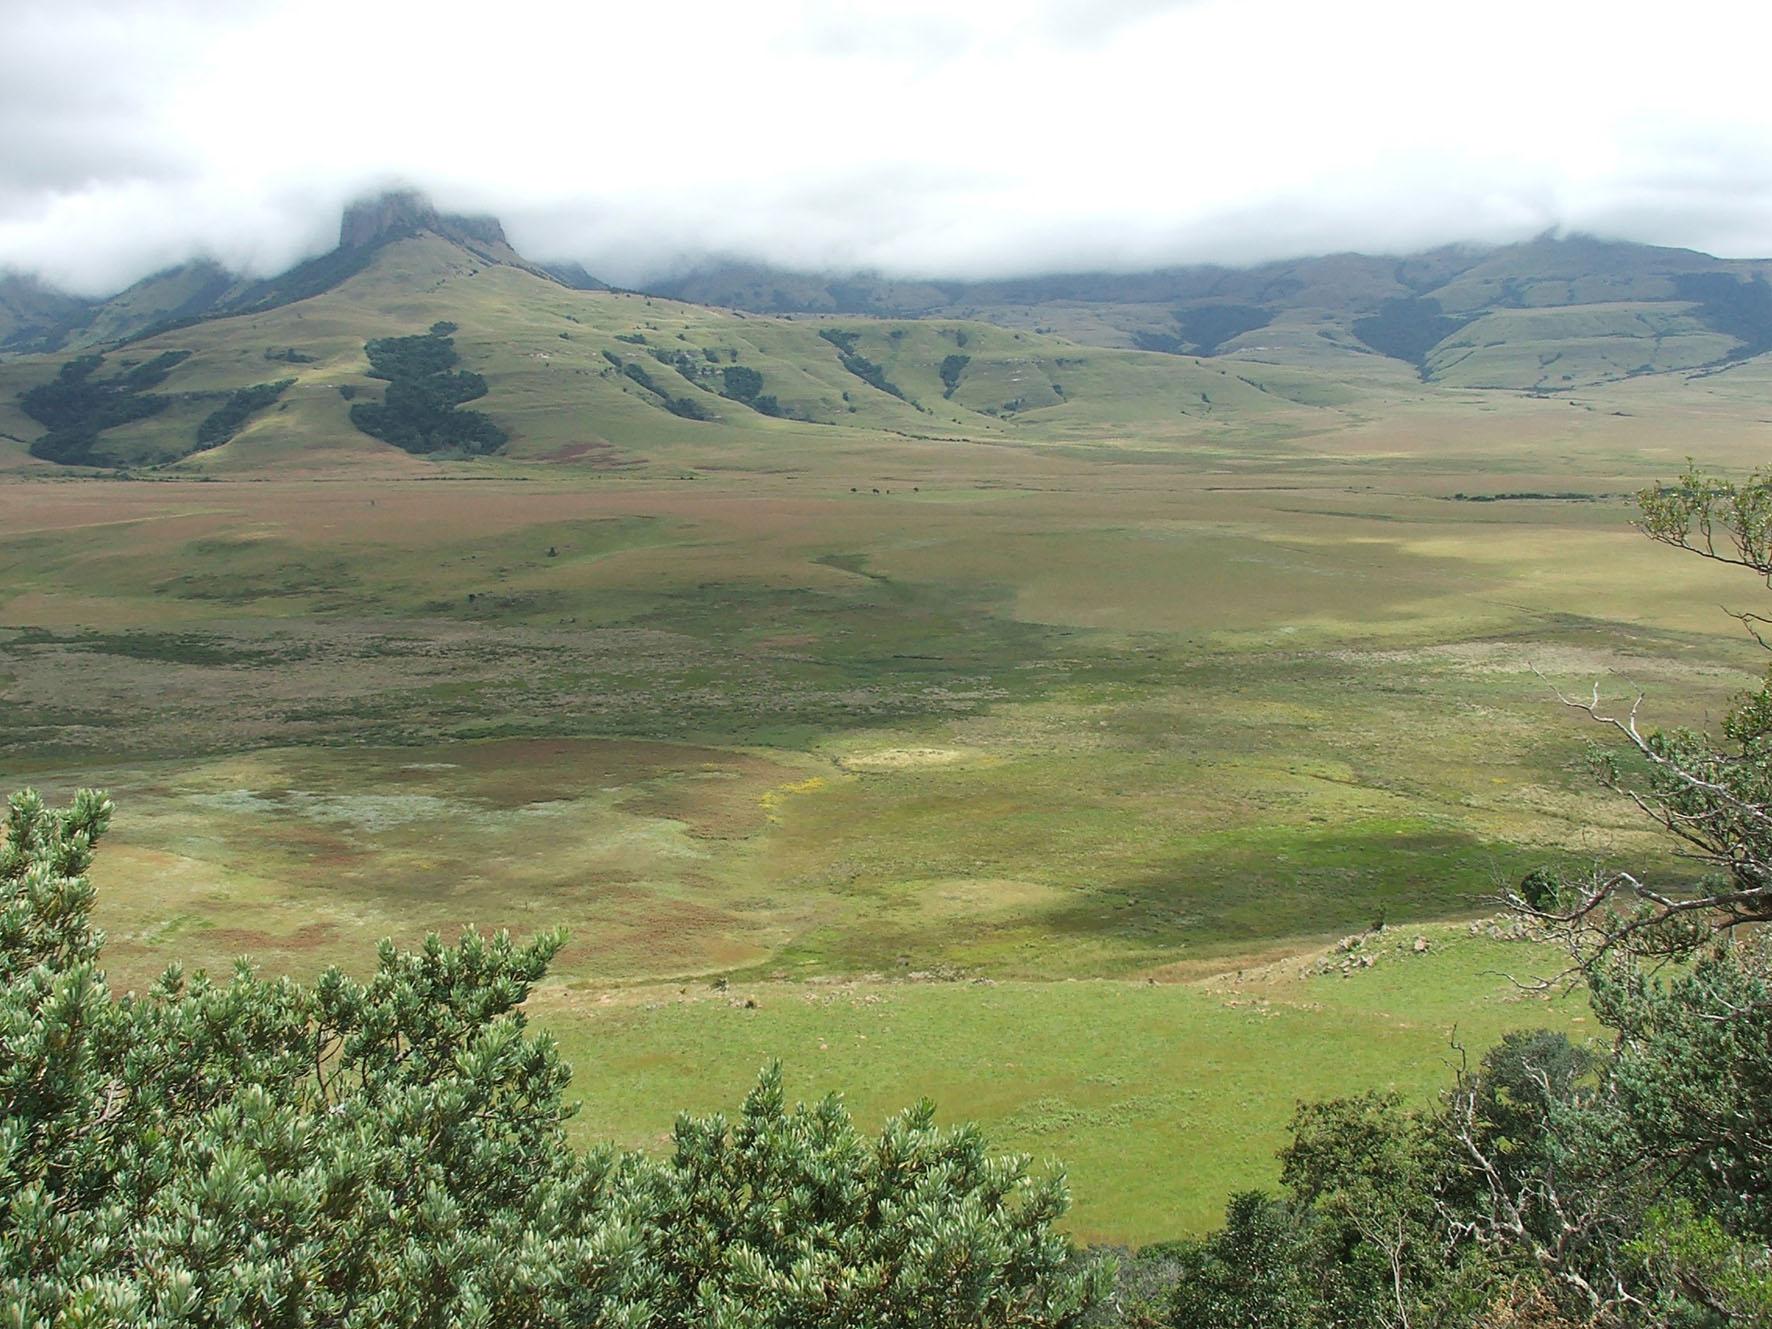 Protected environment victory for SA